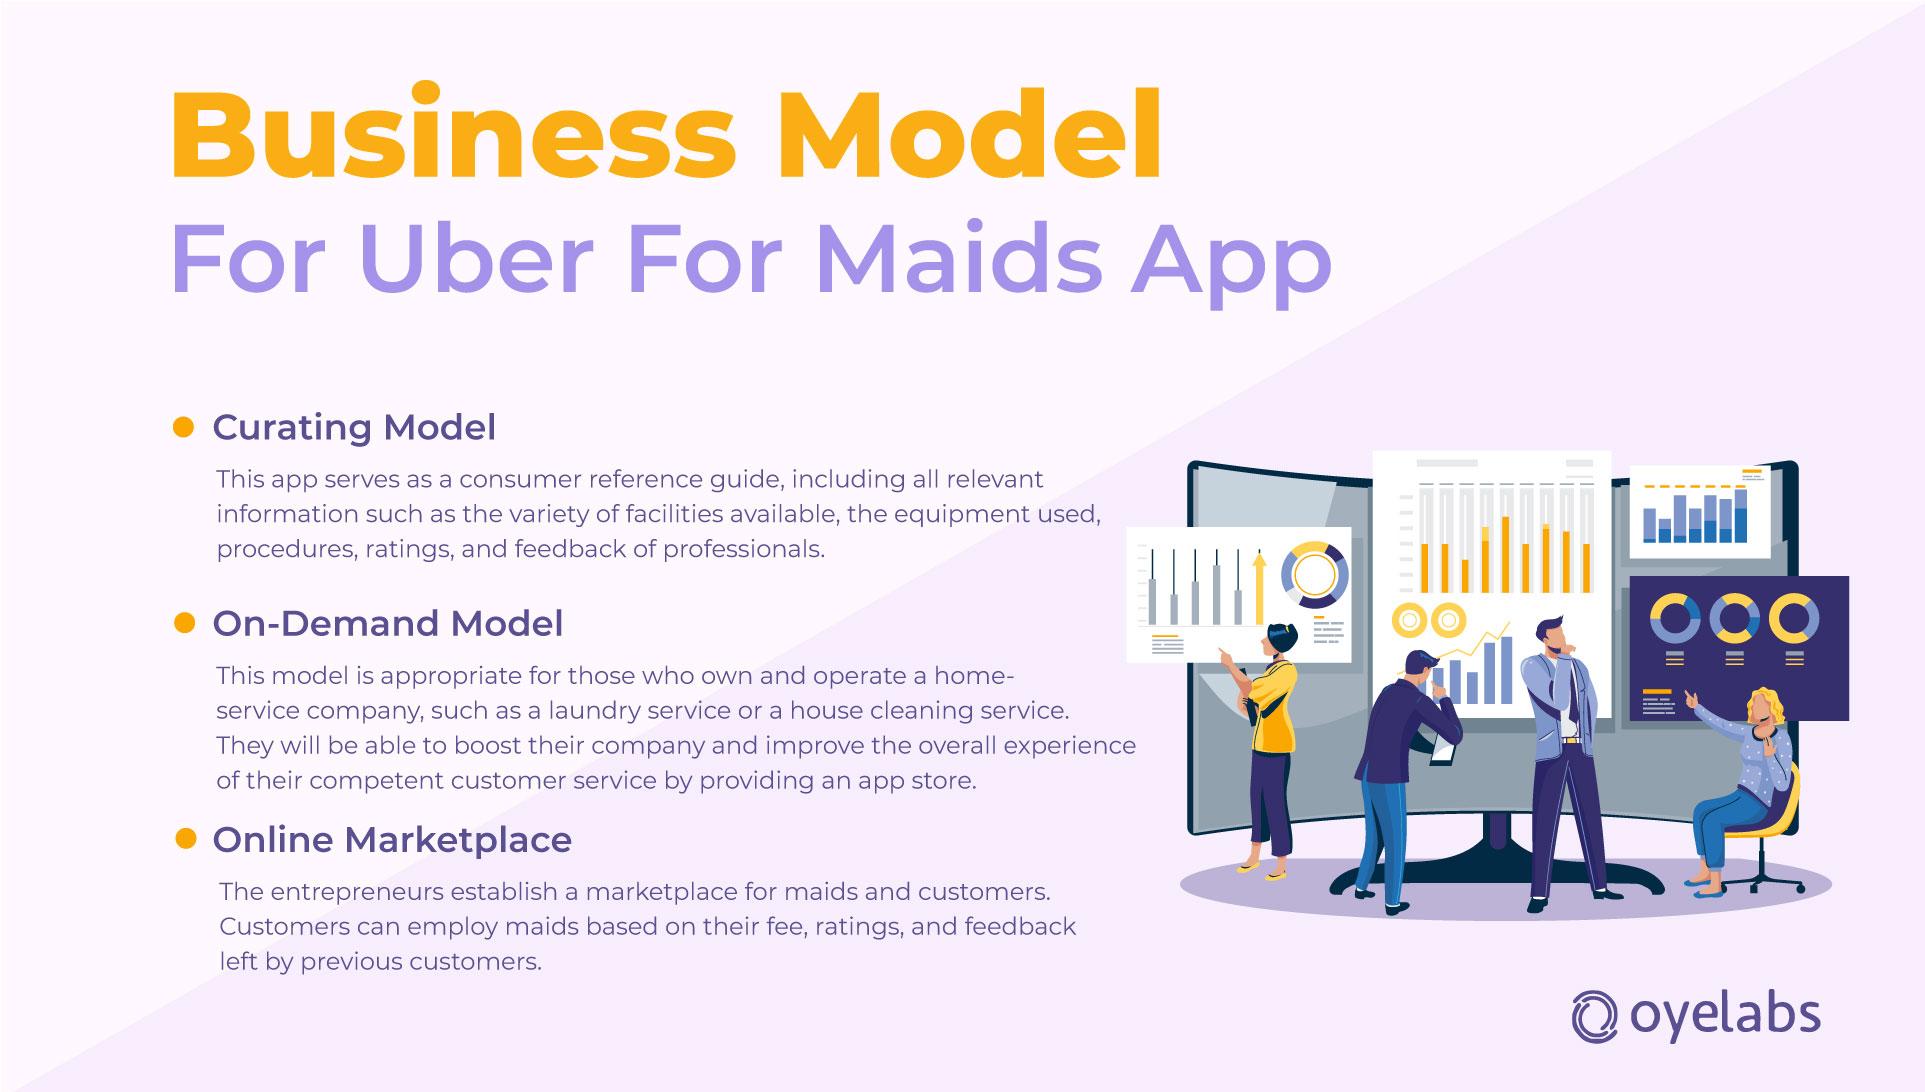 Business-Model-of-Uber-for-maid-app